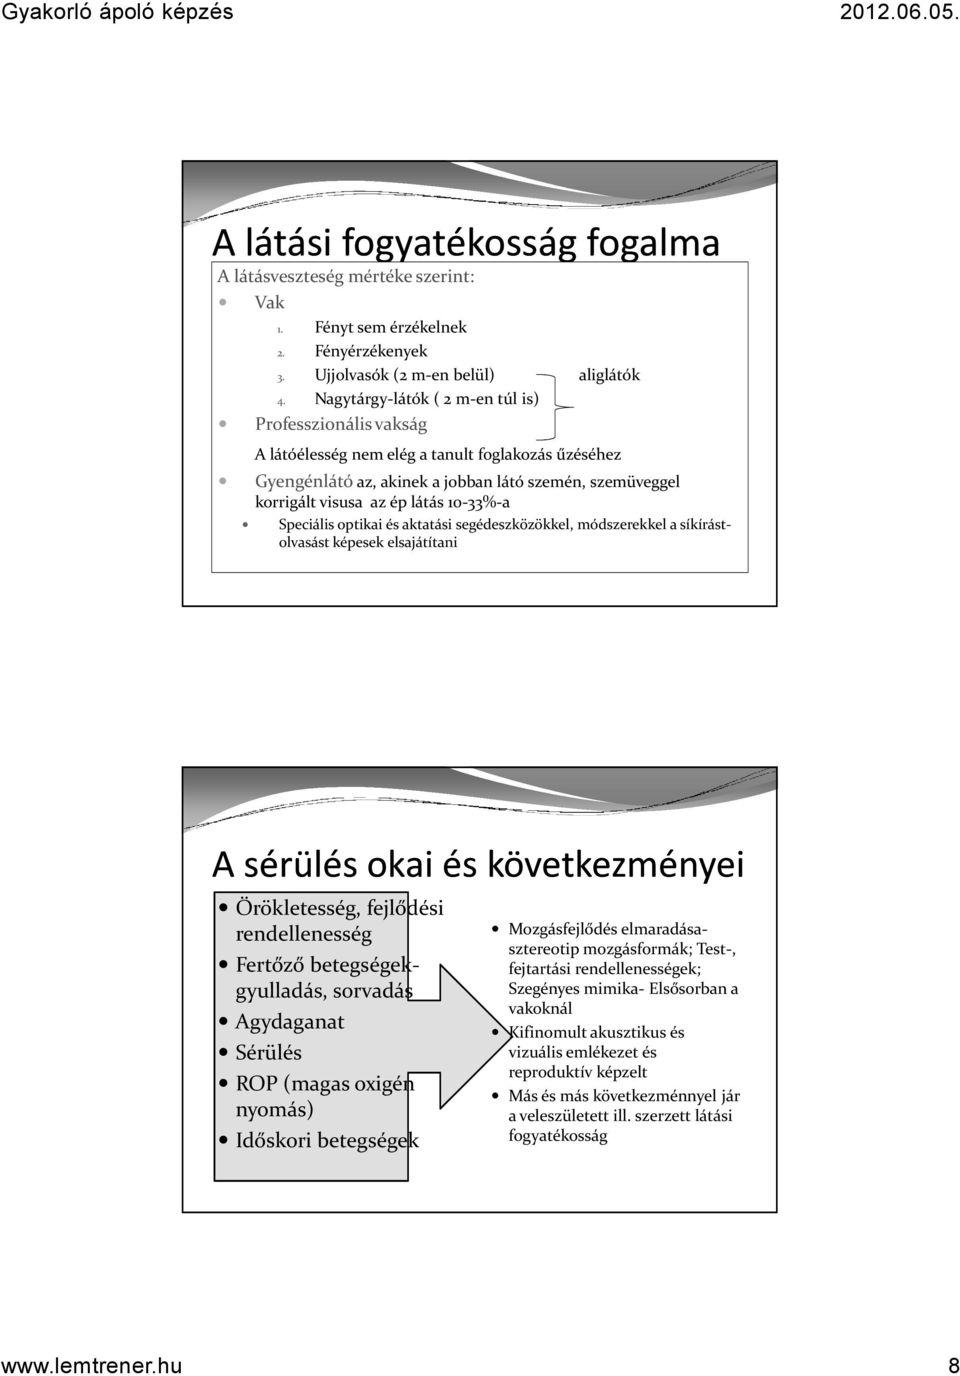 magas vérnyomás 3 fokú fogyatékosság magas vérnyomás norma